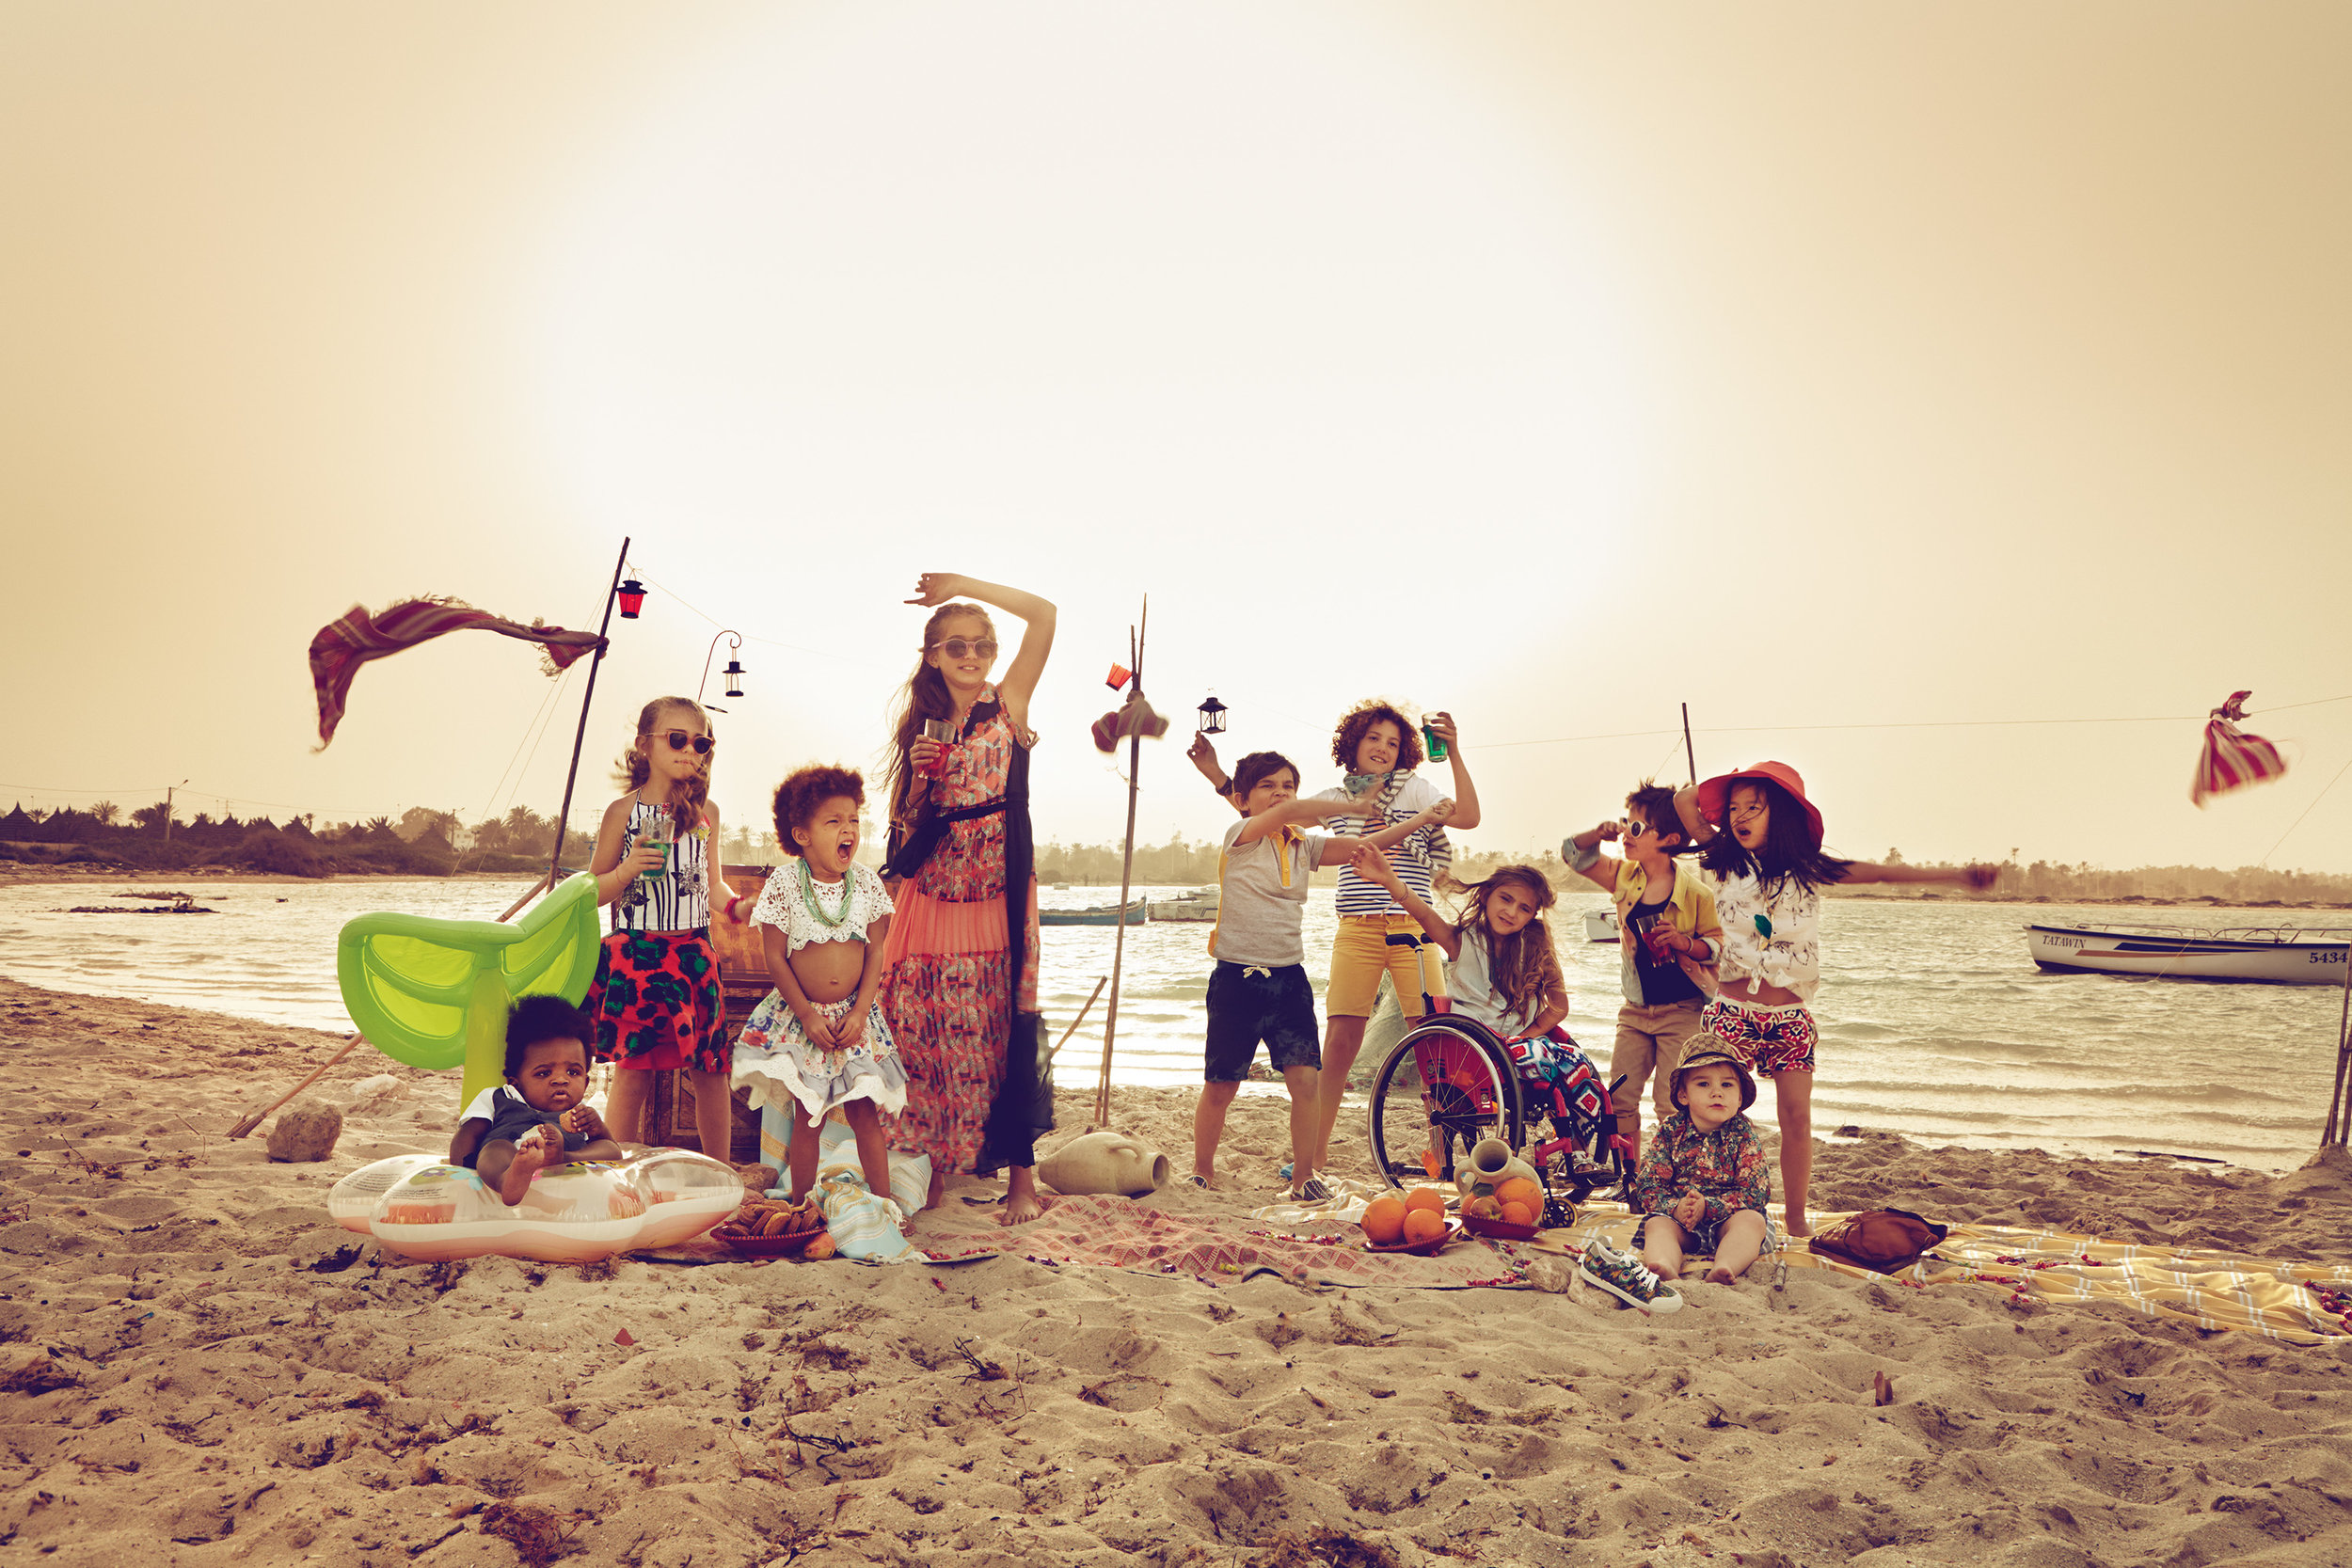 Ilve Little Children on beach